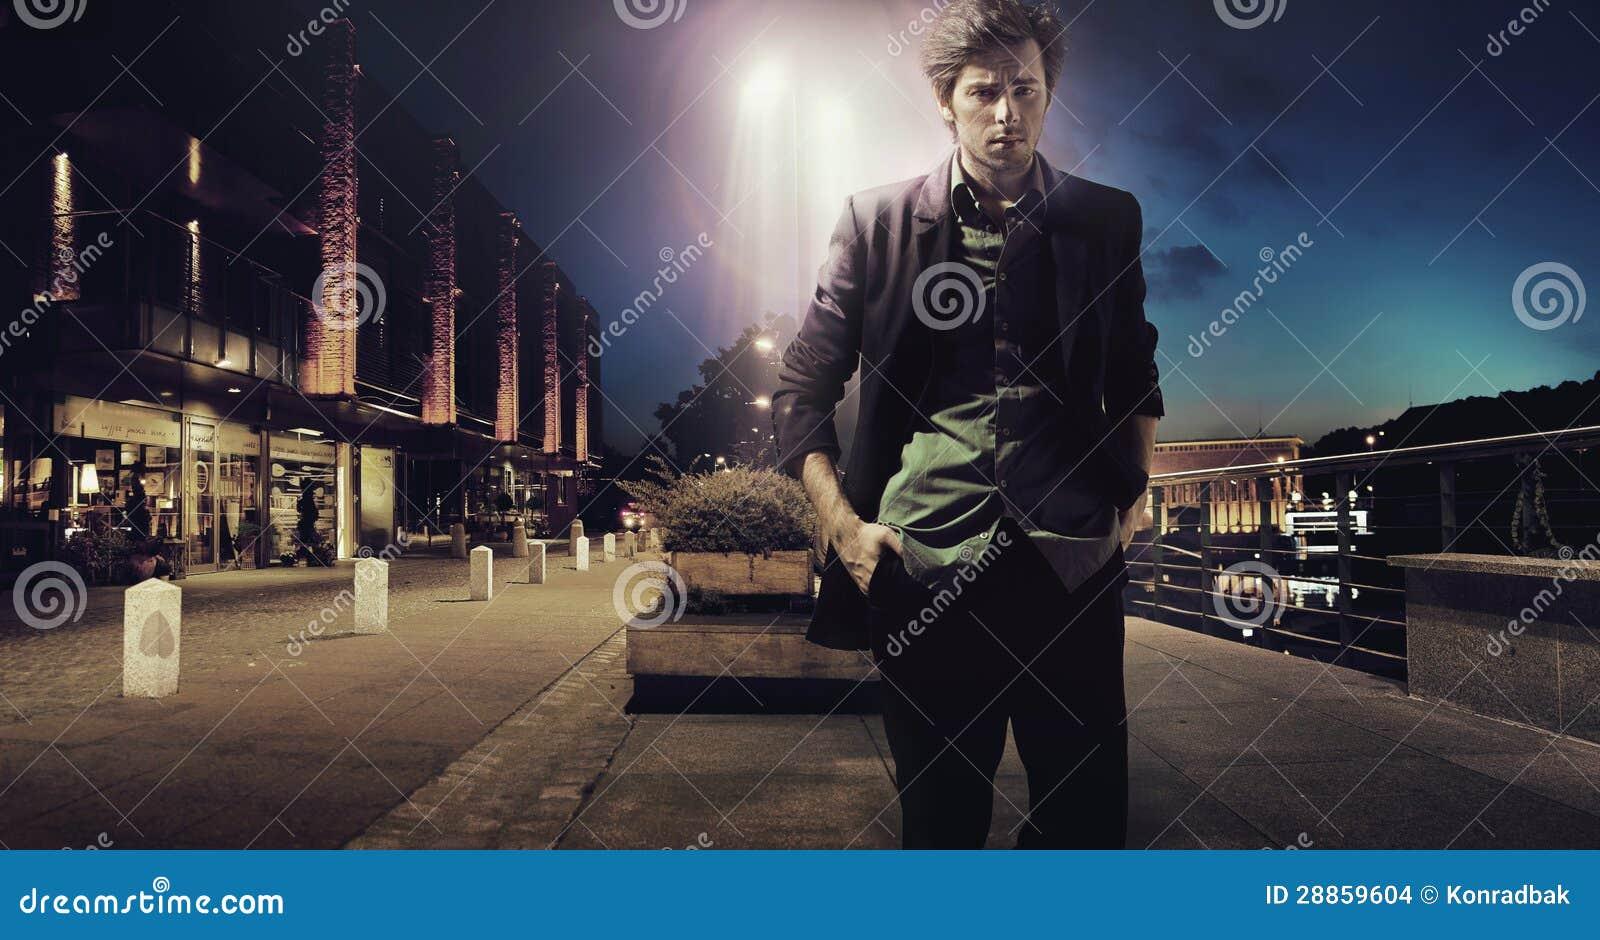 Sad Man Walking Alone At The Night Stock Images - Image ...